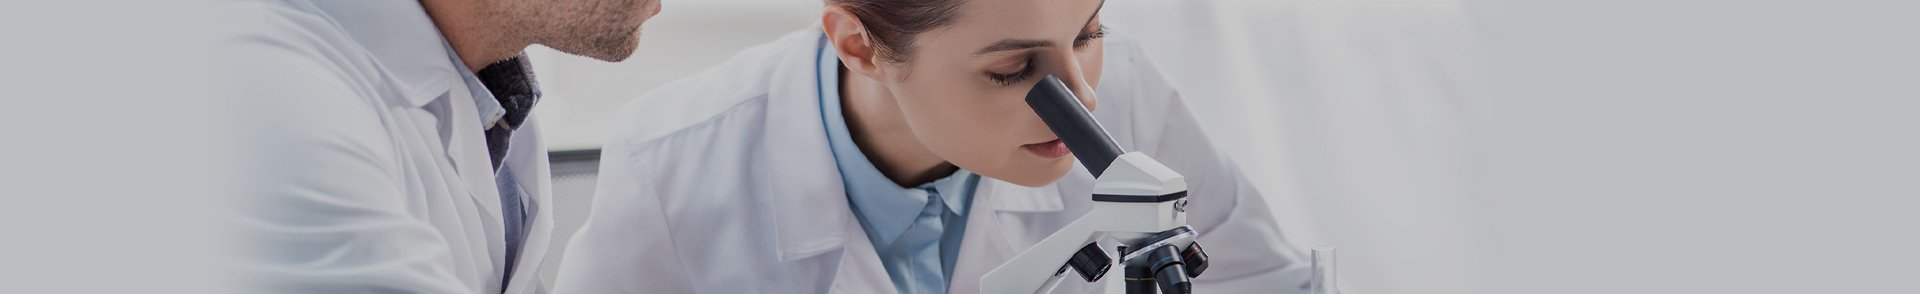 Scientific-Device-Labratory-header-01